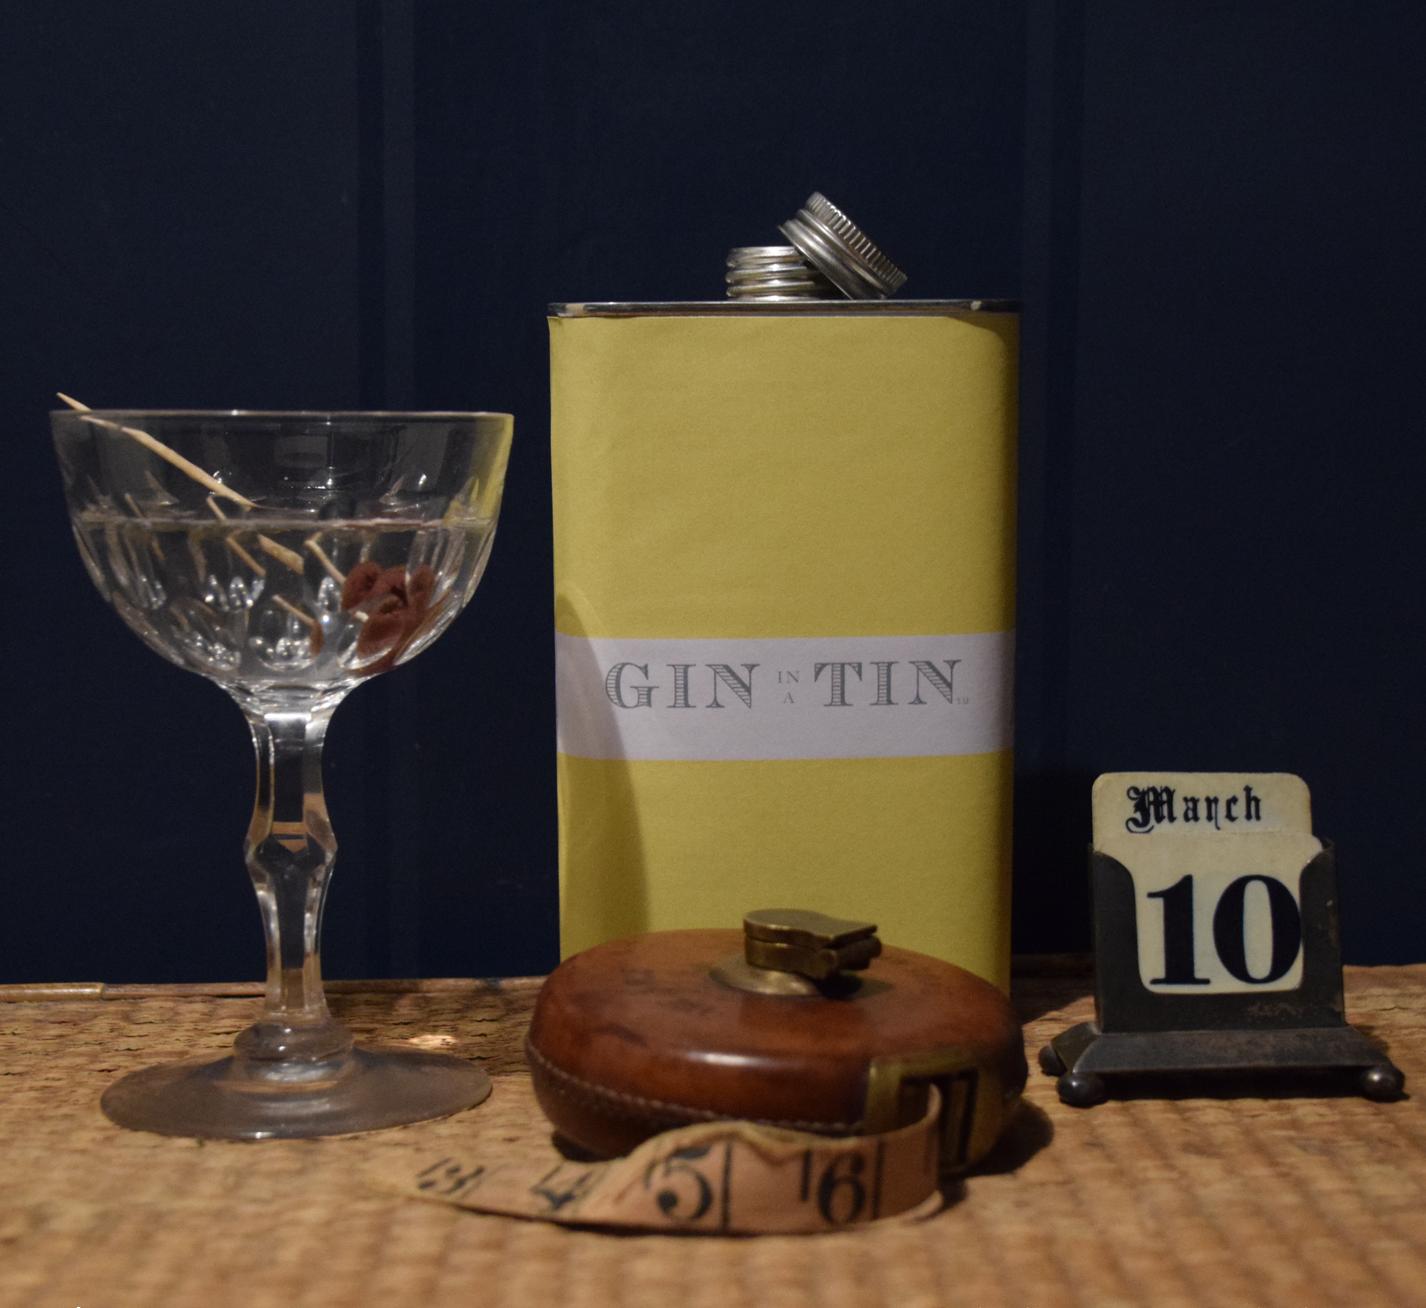 Gin In A Tin - Blend 5